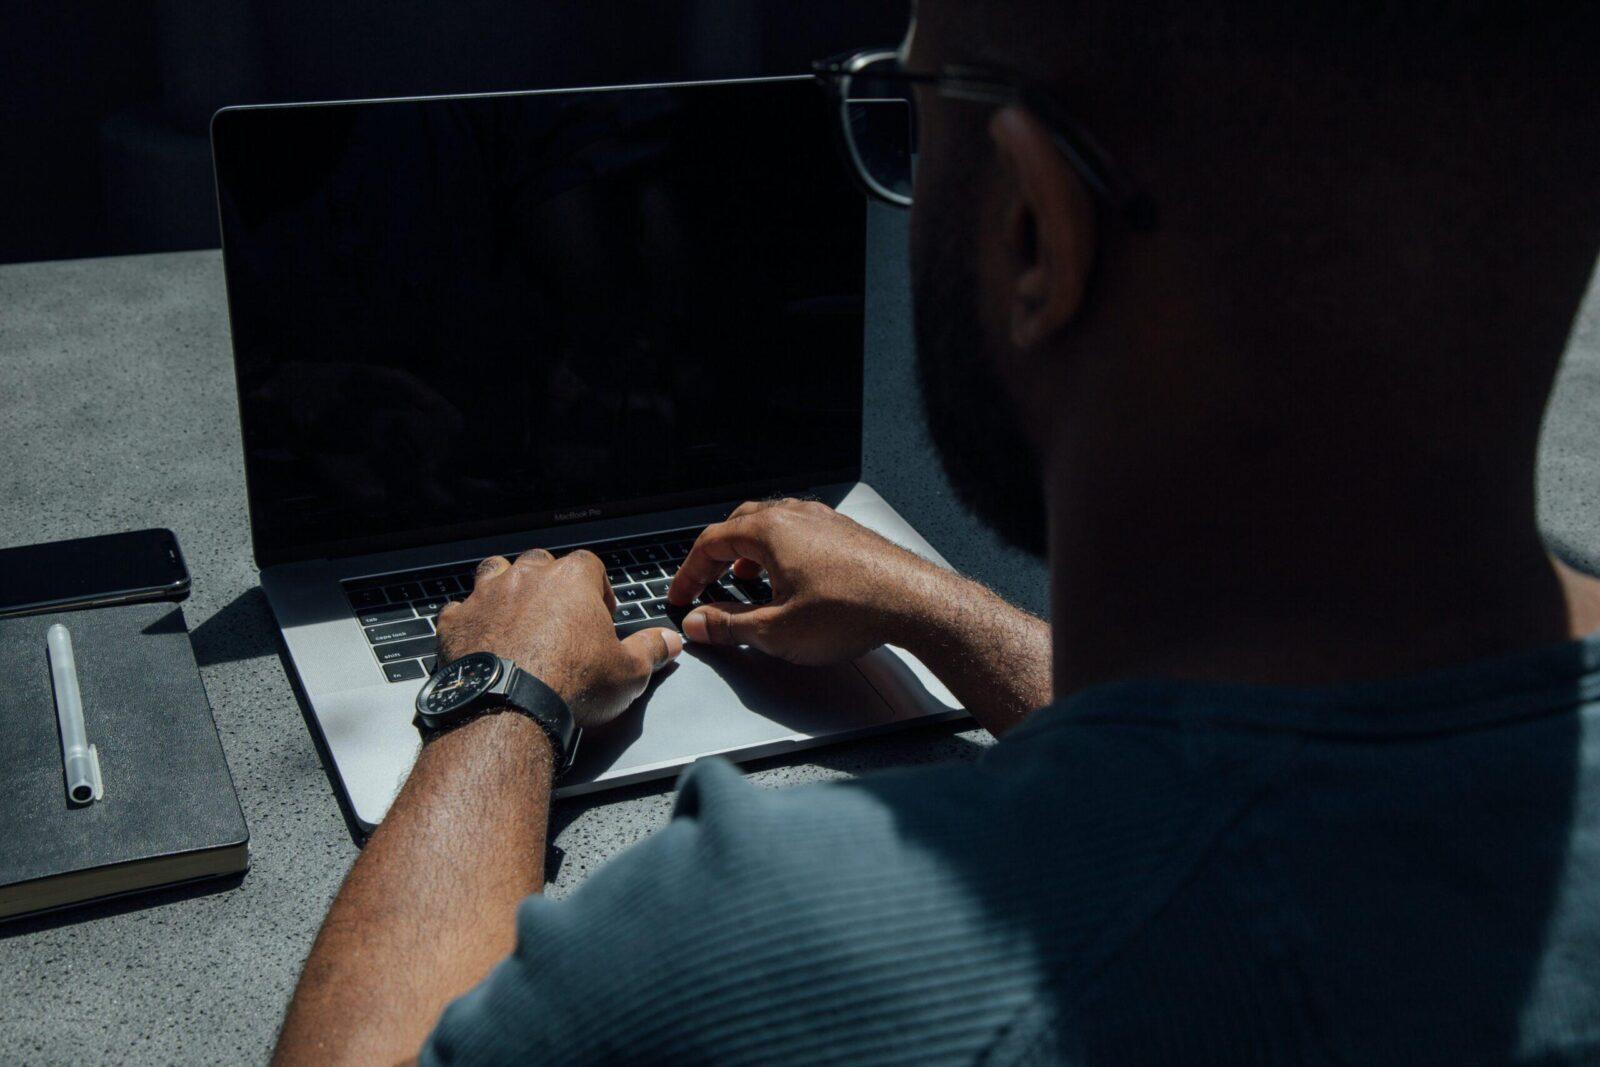 man using laptop computer on desk